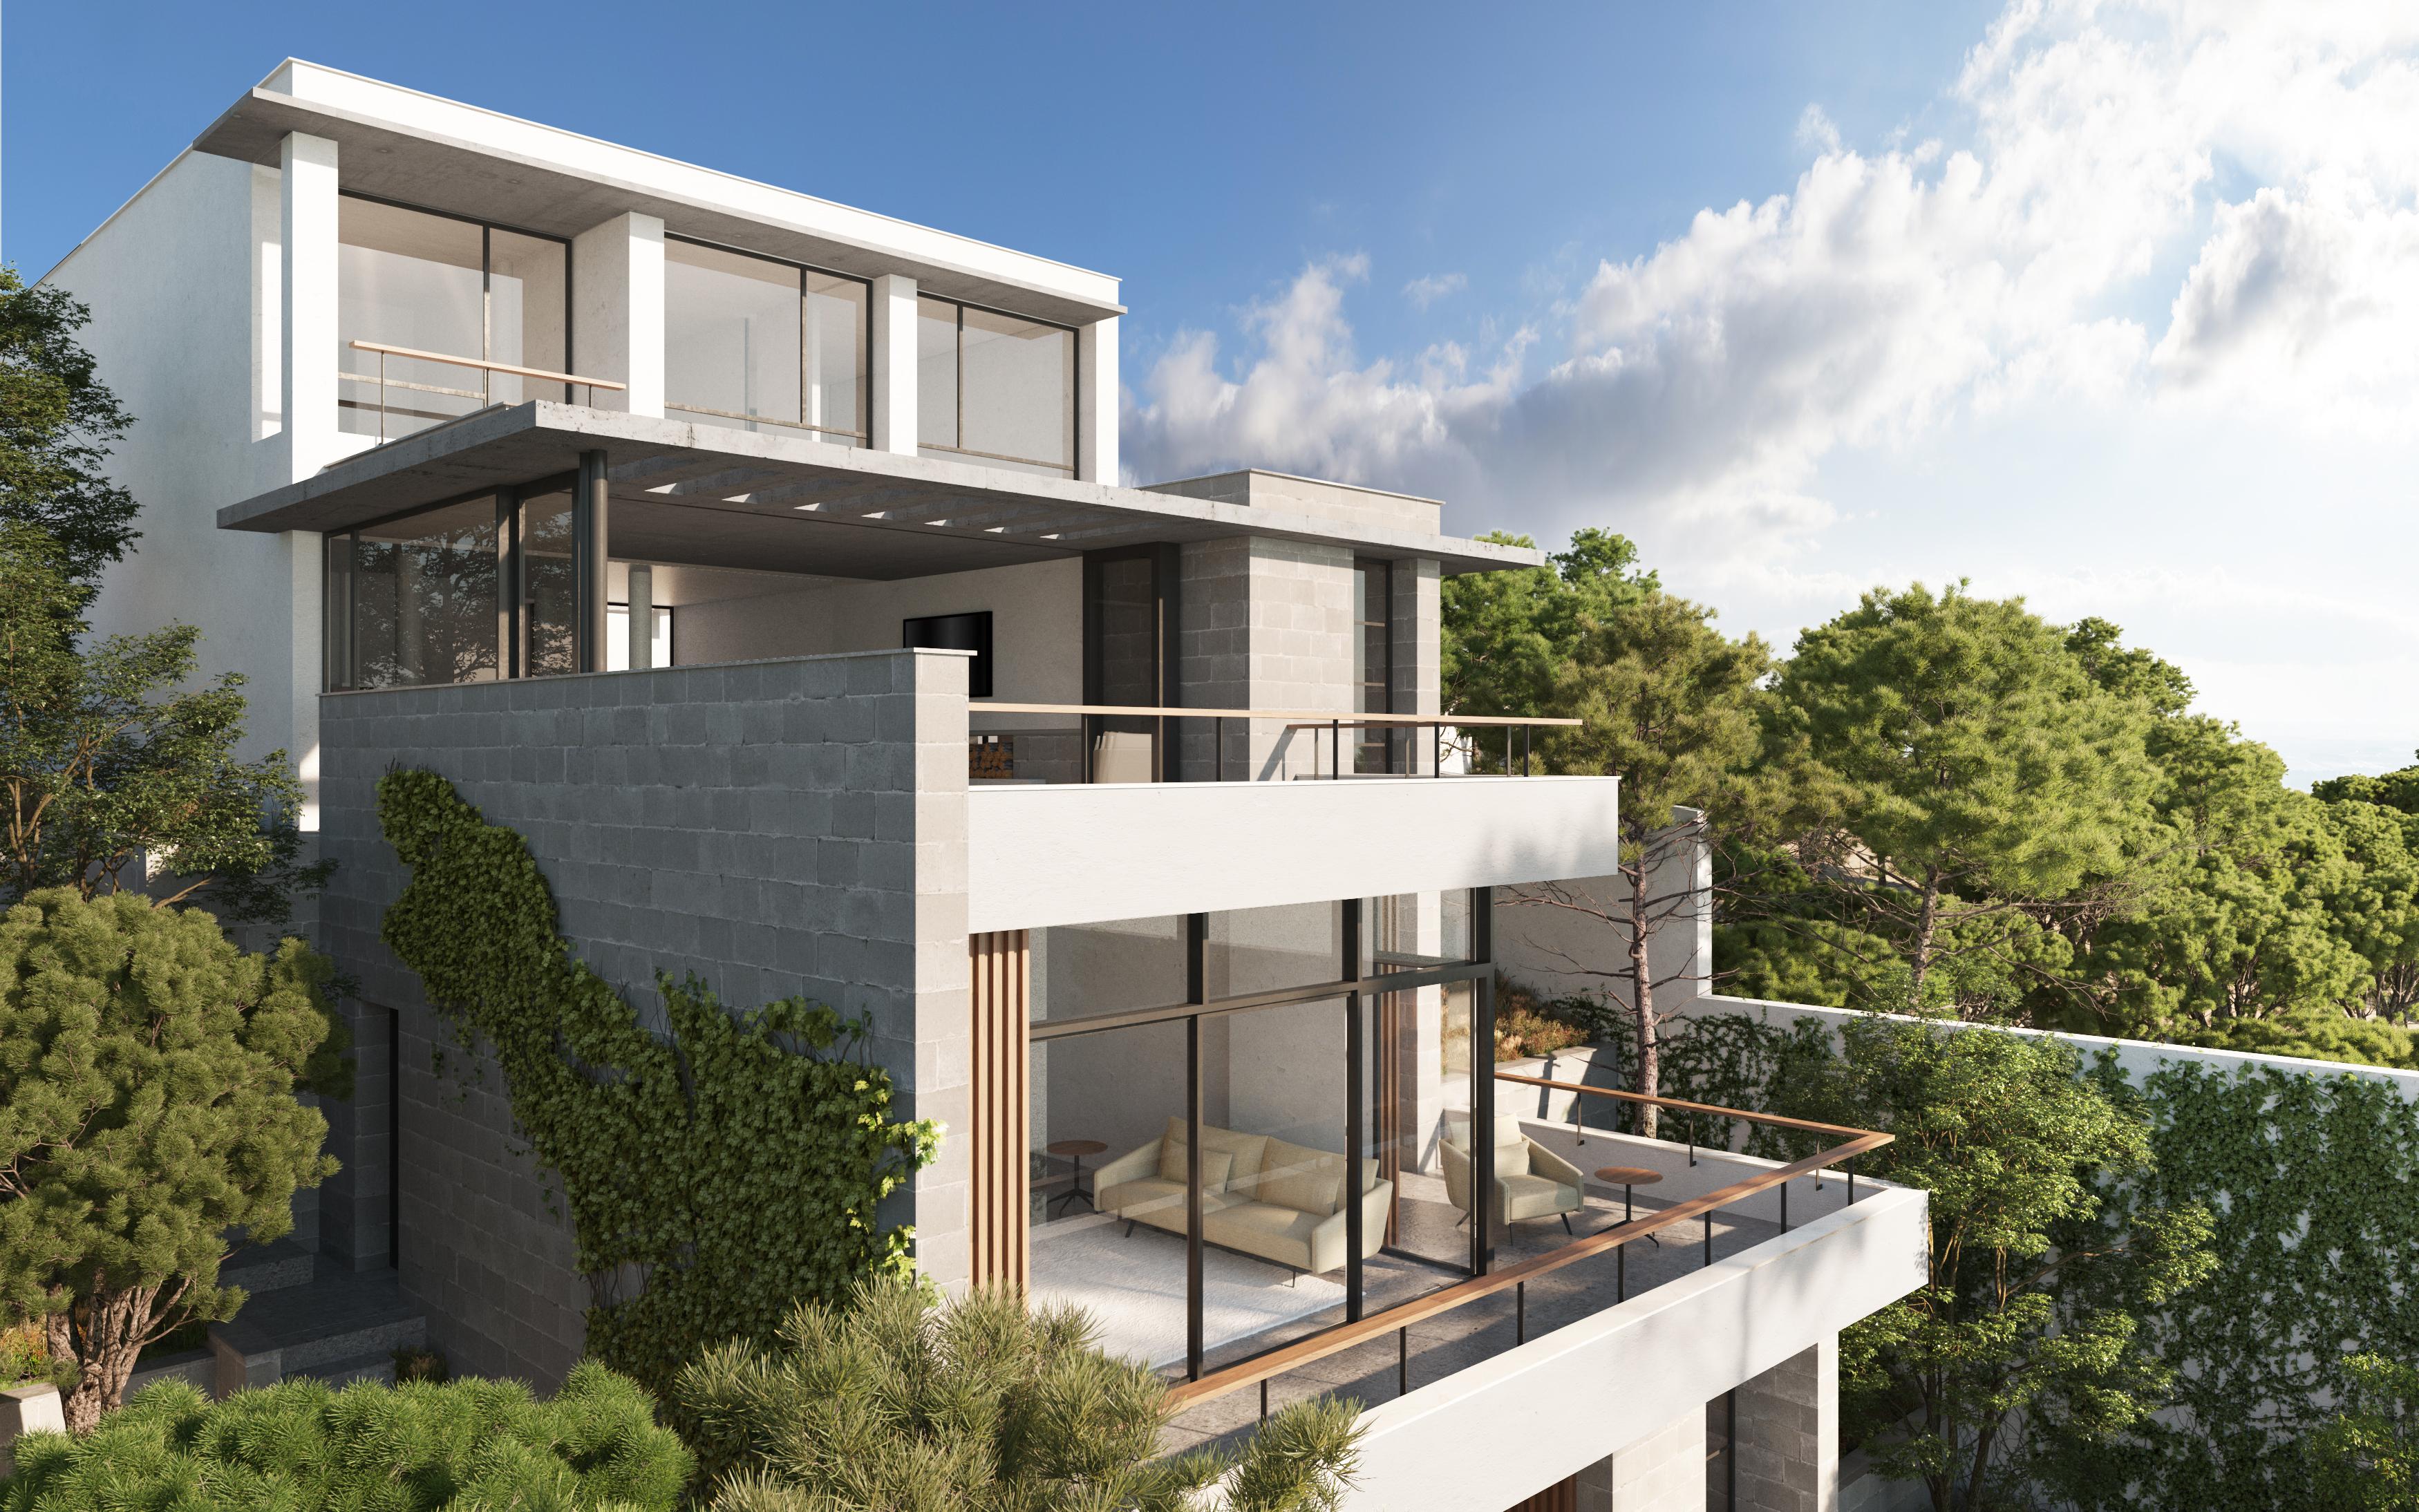 new-villa-vallpineda-la-plana-rardo-architects-arquitectos-sitges-barcelona